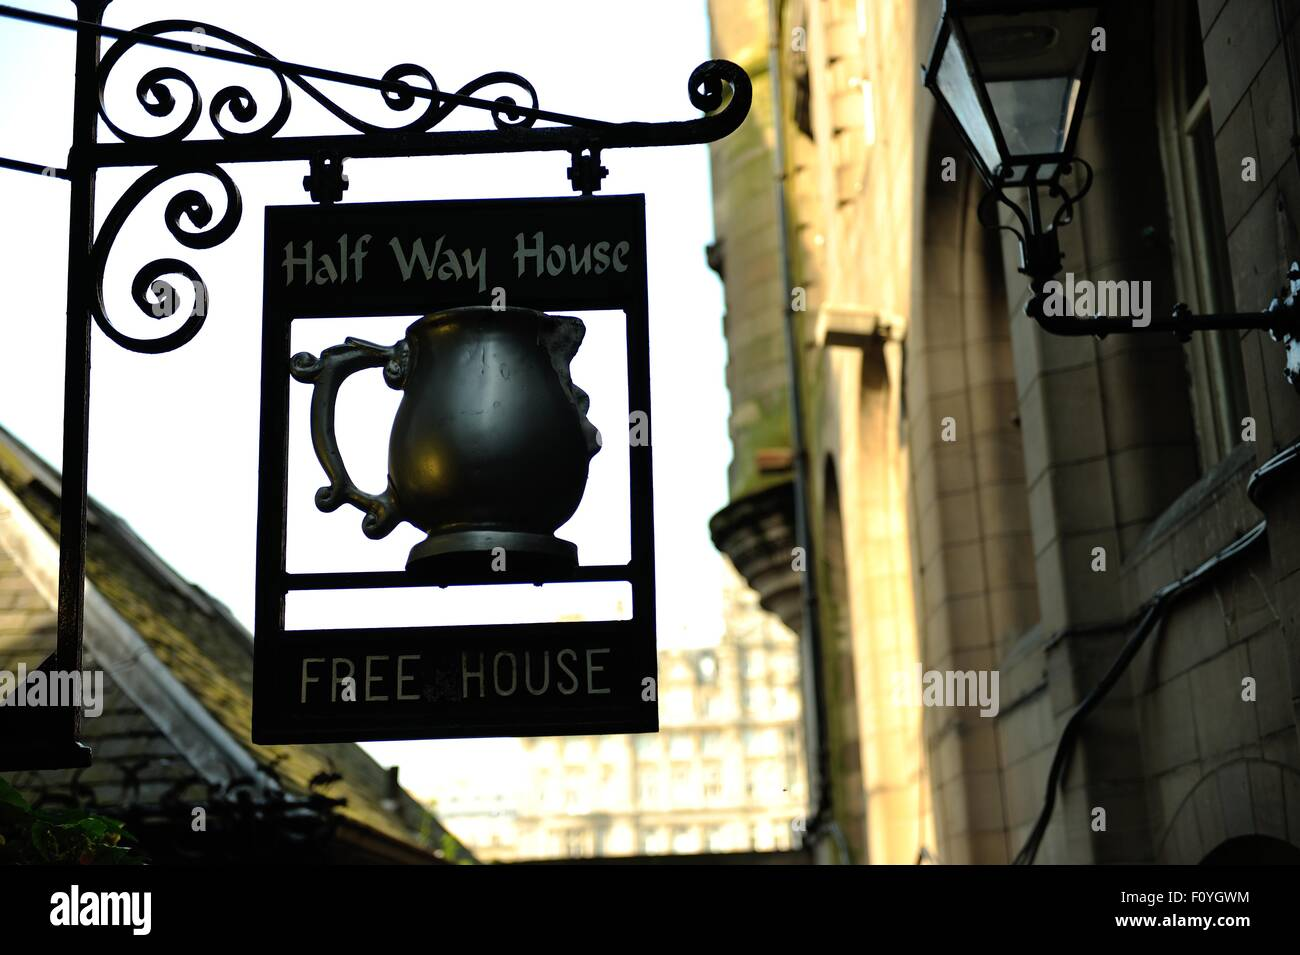 Edinburgh, Scotland, UK. 23rd August, 2015. Halfway House, the smallest pub in Edinburgh Credit:  Tony Clerkson/Alamy - Stock Image